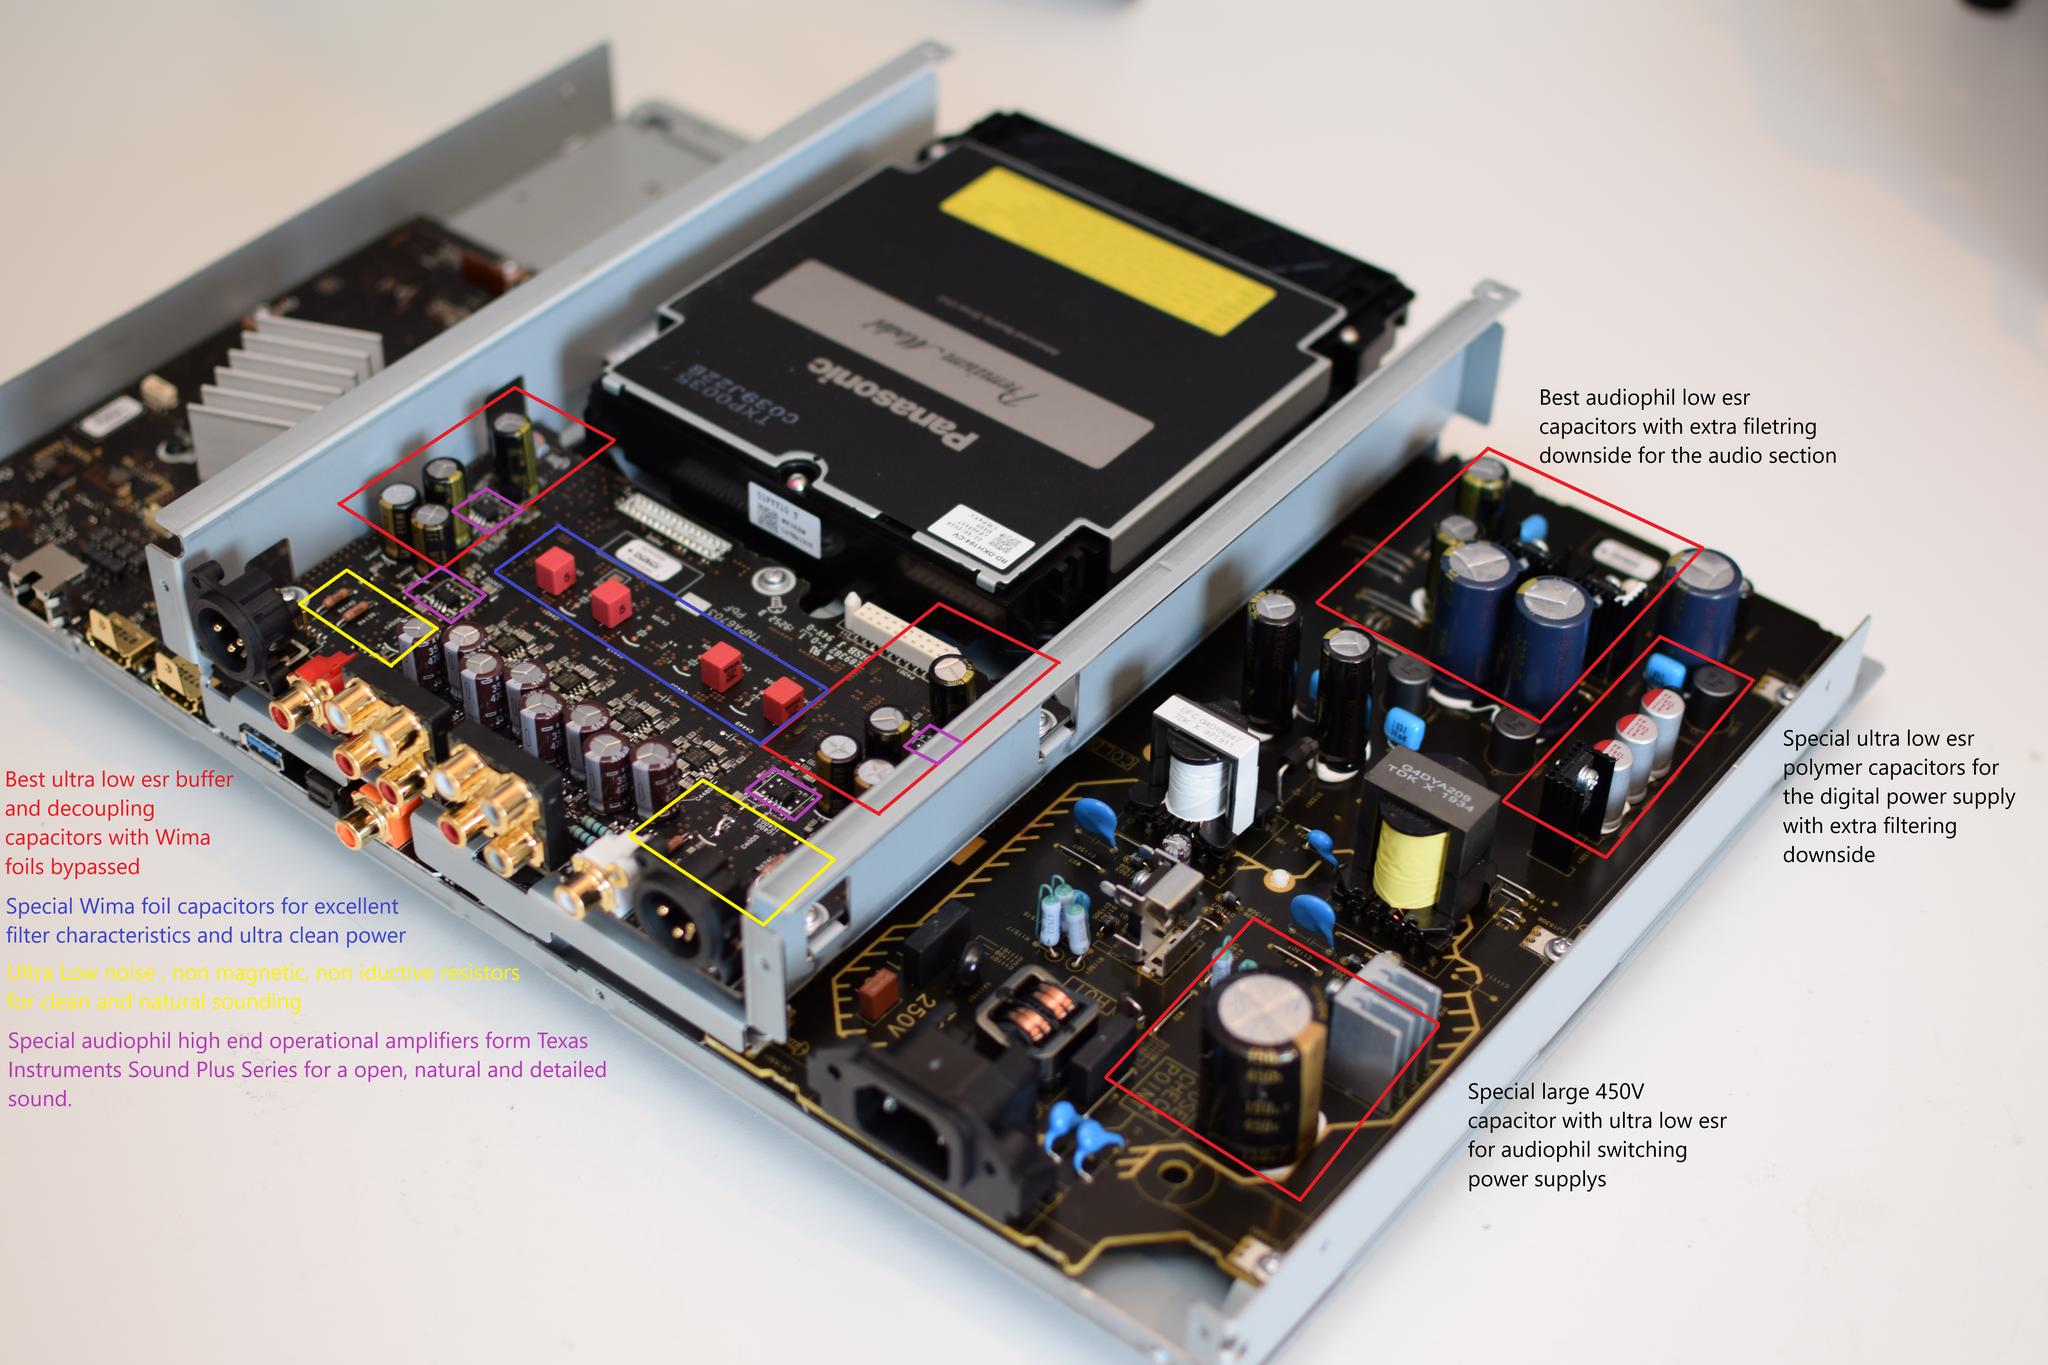 Panasonic DP-UB9004 9000 Features der Modifikation